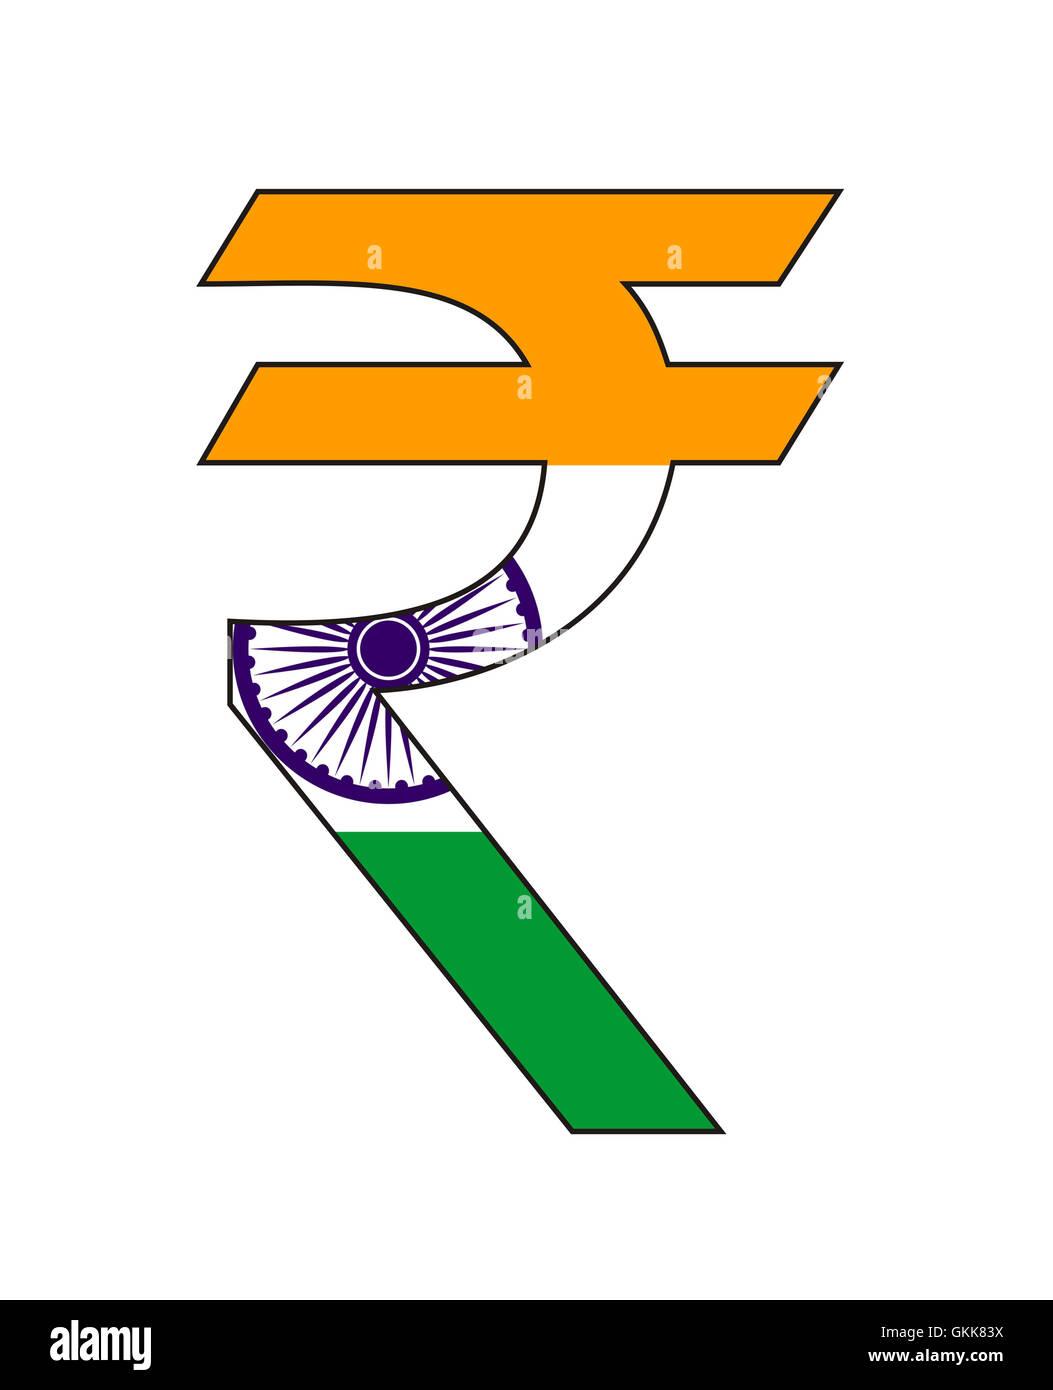 Rupee symbol stock photo royalty free image 115364142 alamy rupee symbol biocorpaavc Choice Image